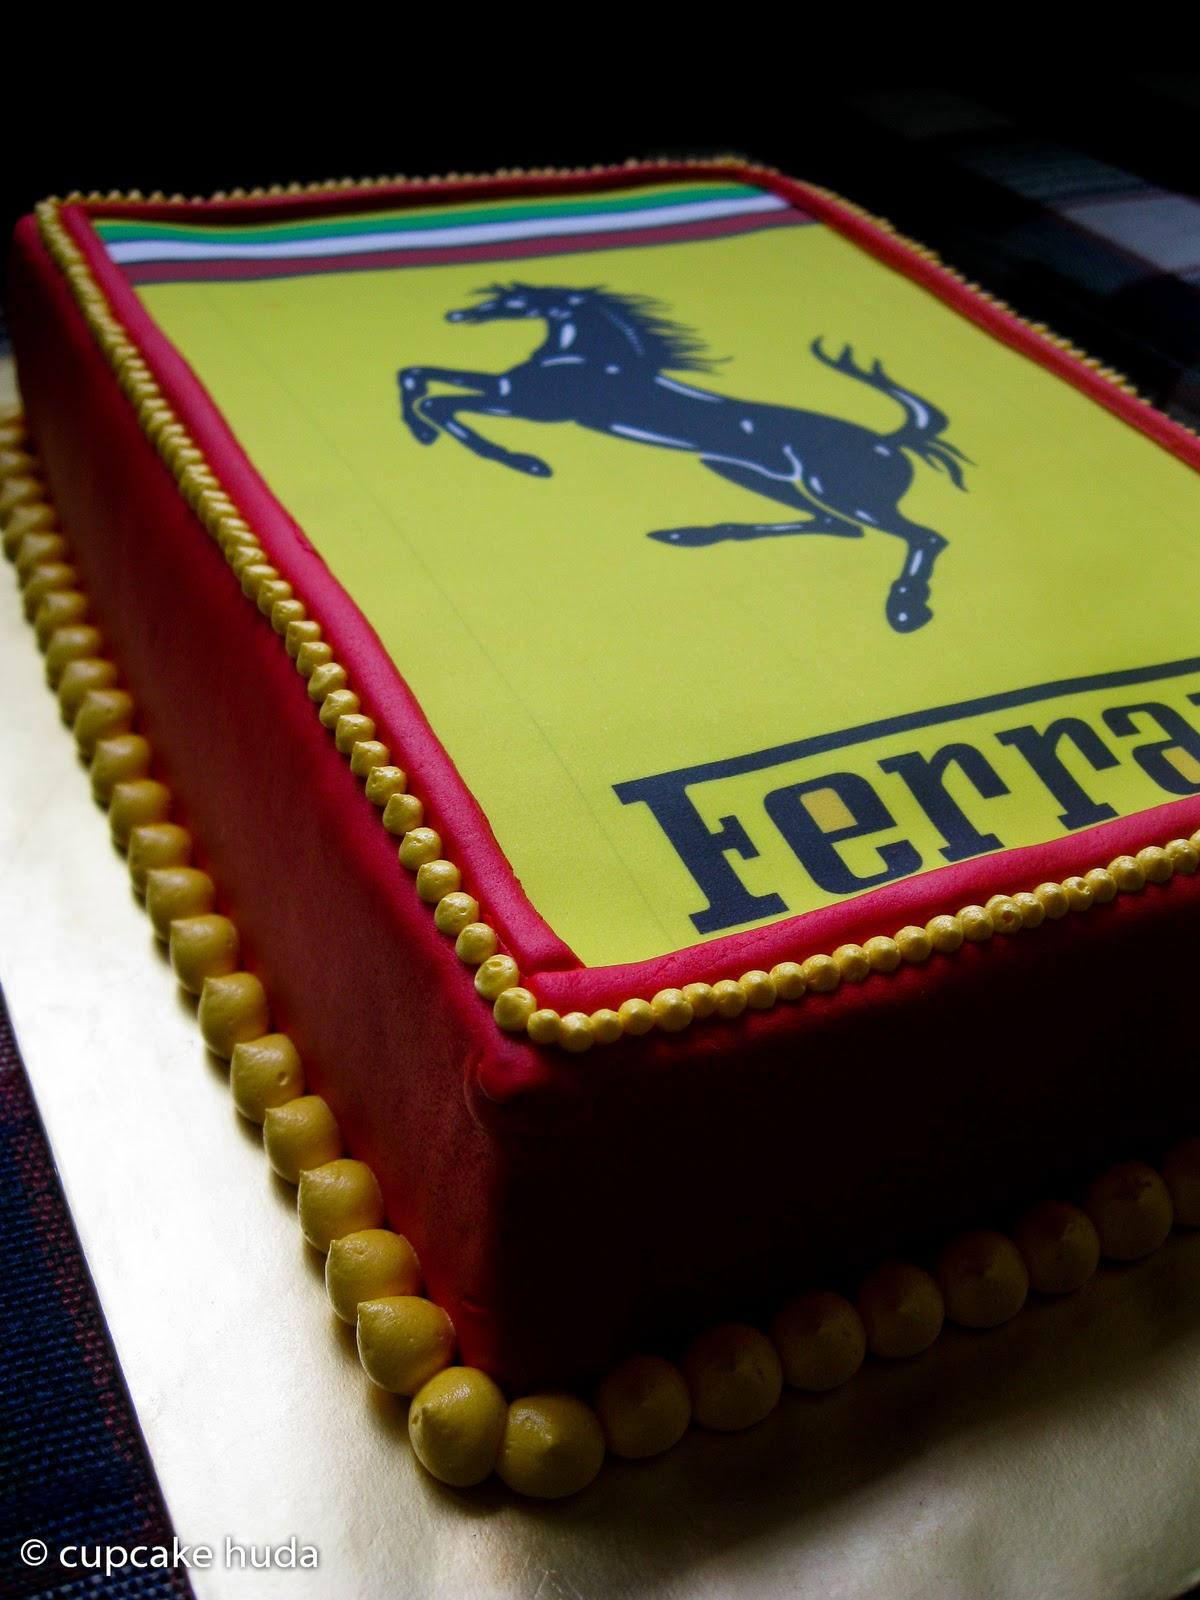 Happy Birthday Azlita Cupcake Huda